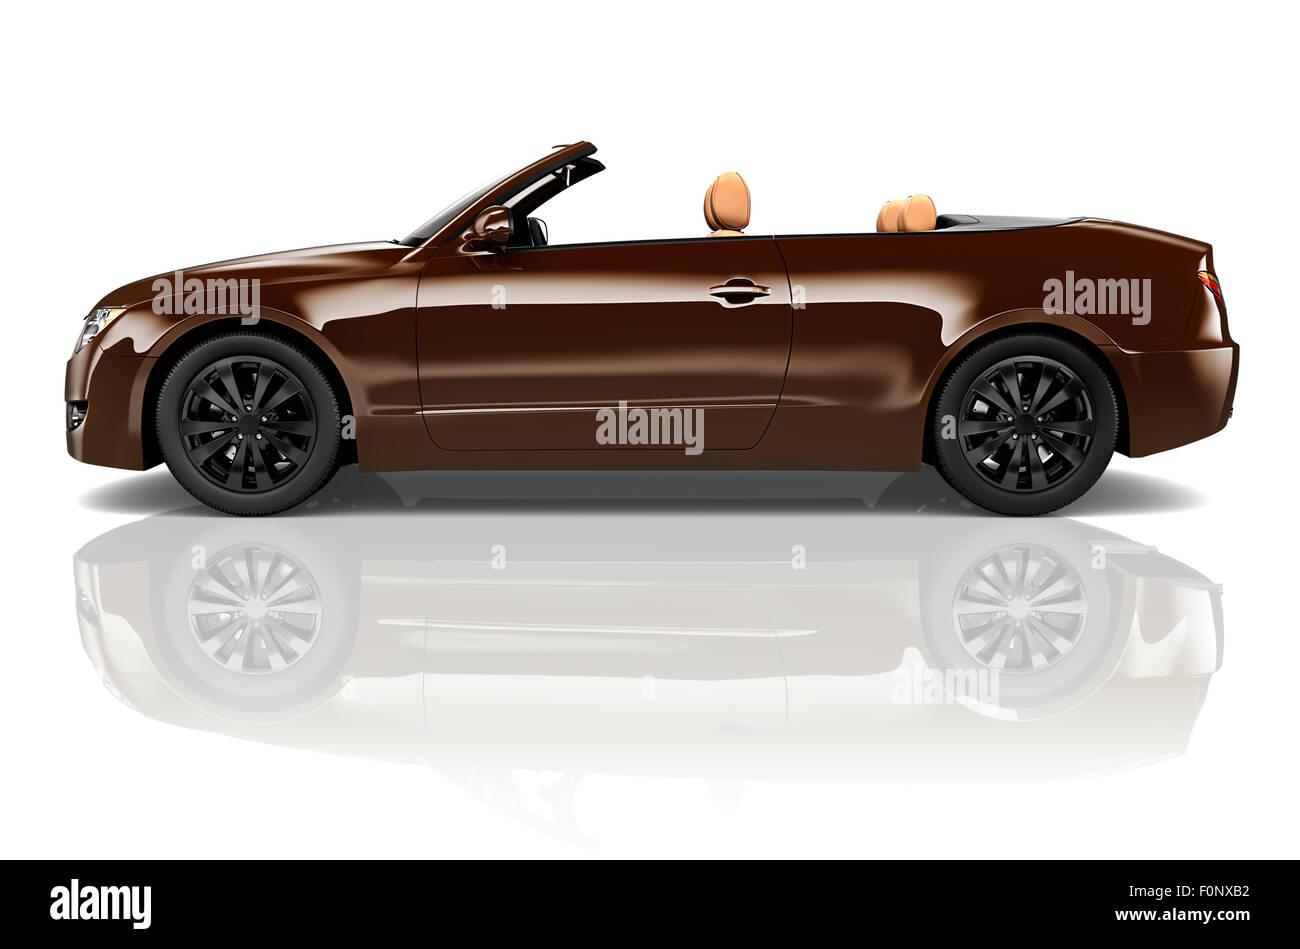 Car Convertible Transportation 3D Illustration Concept - Stock Image